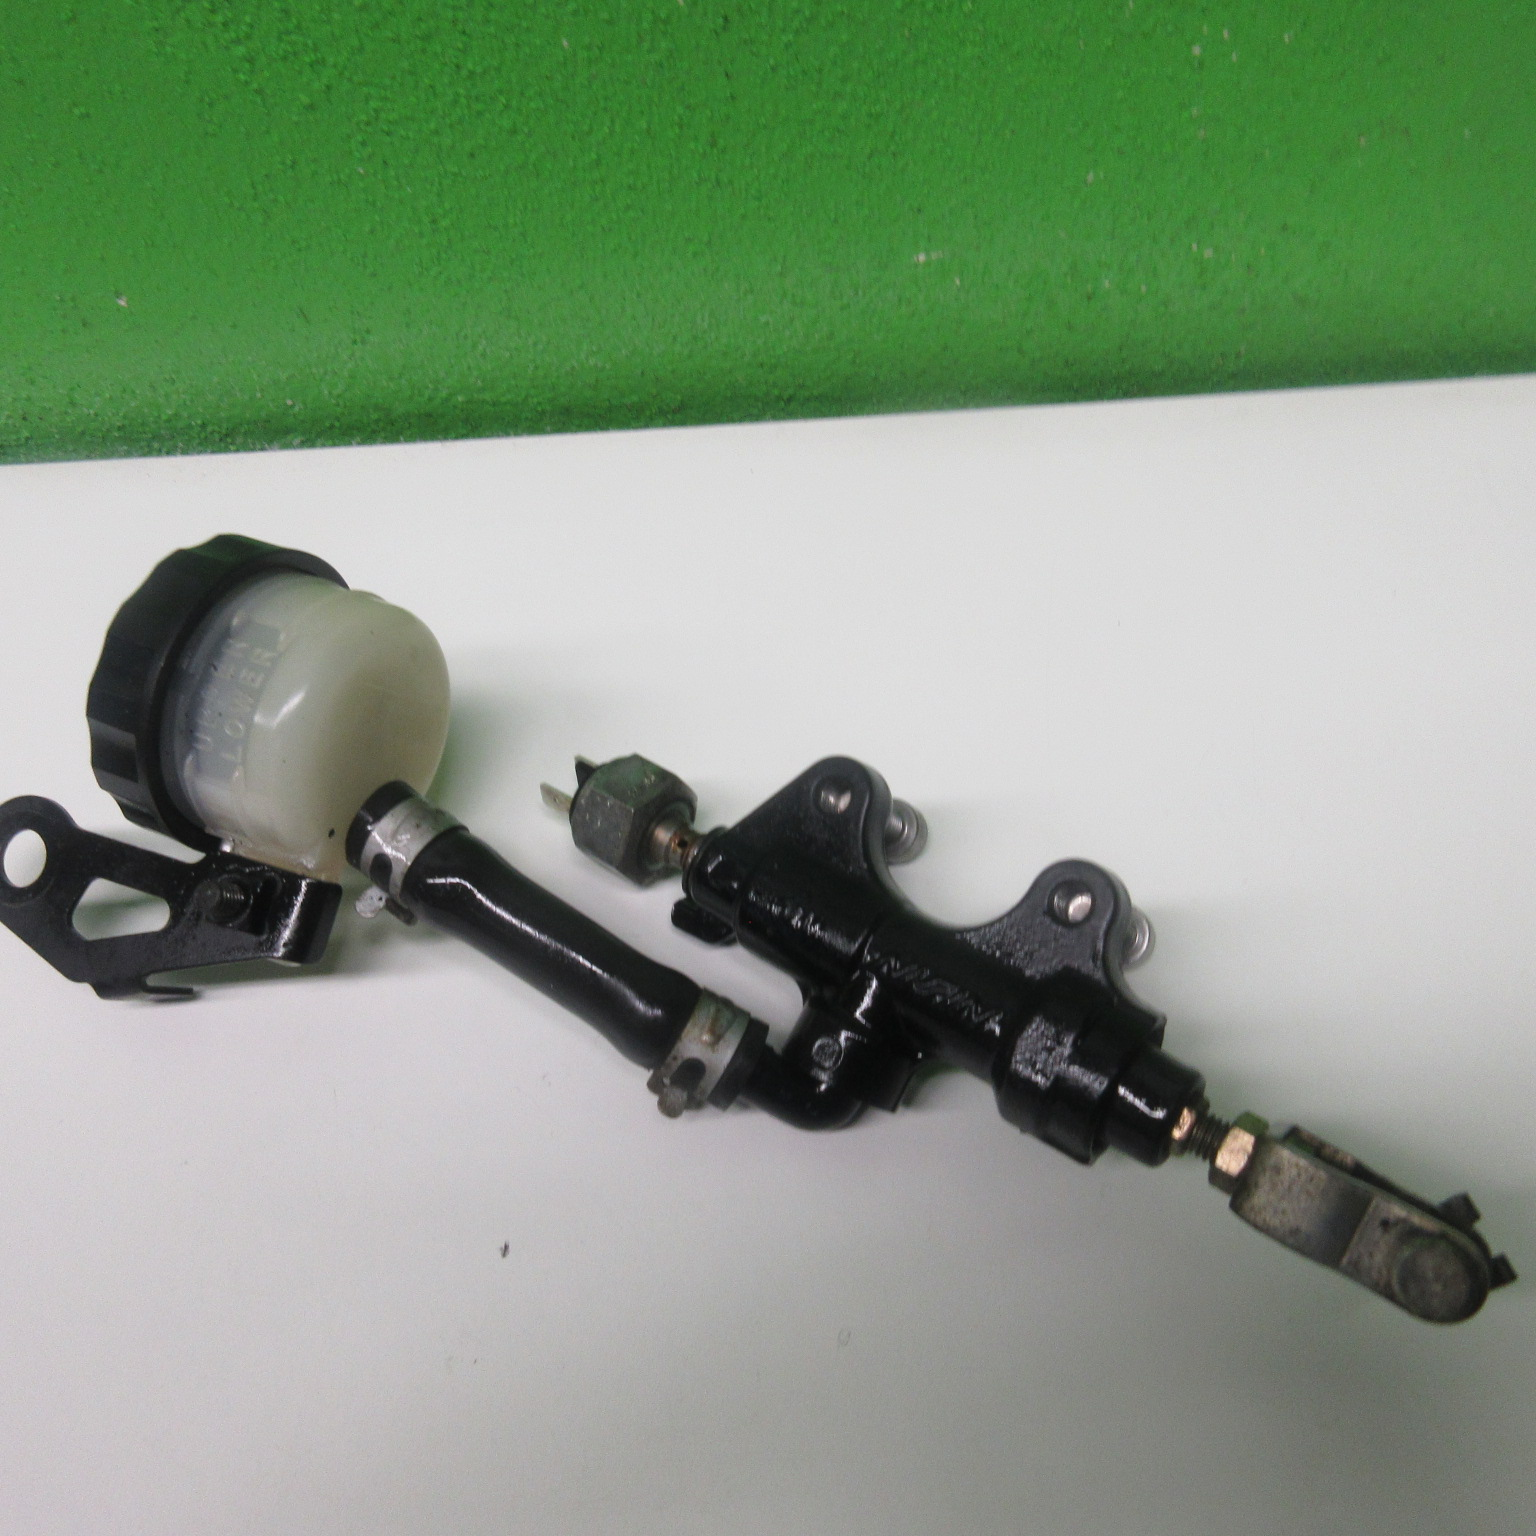 Bremspumpe hinten Bremszylinder Triumph Sprint RS 955 695 AC